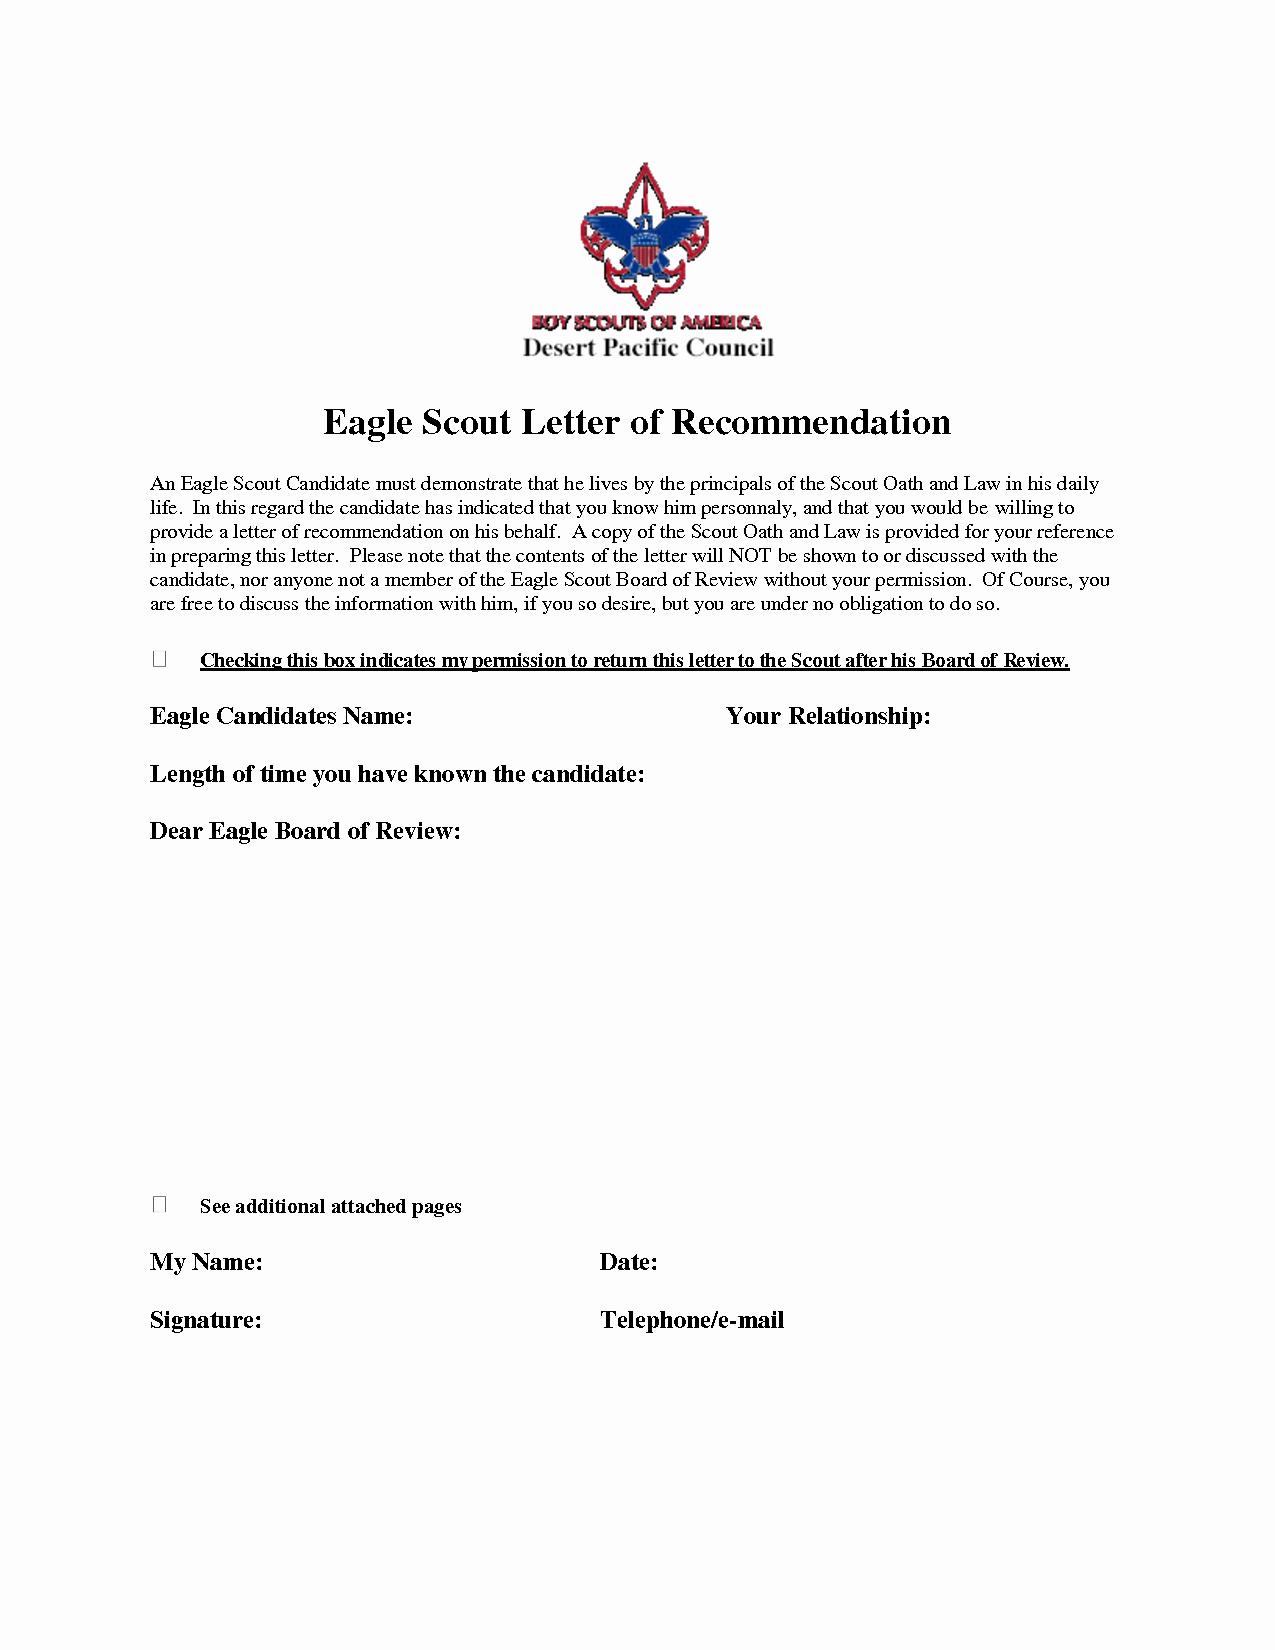 Letter Of Recommendation Letterhead Lovely Eagle Scout Re Mendation Letter Sample